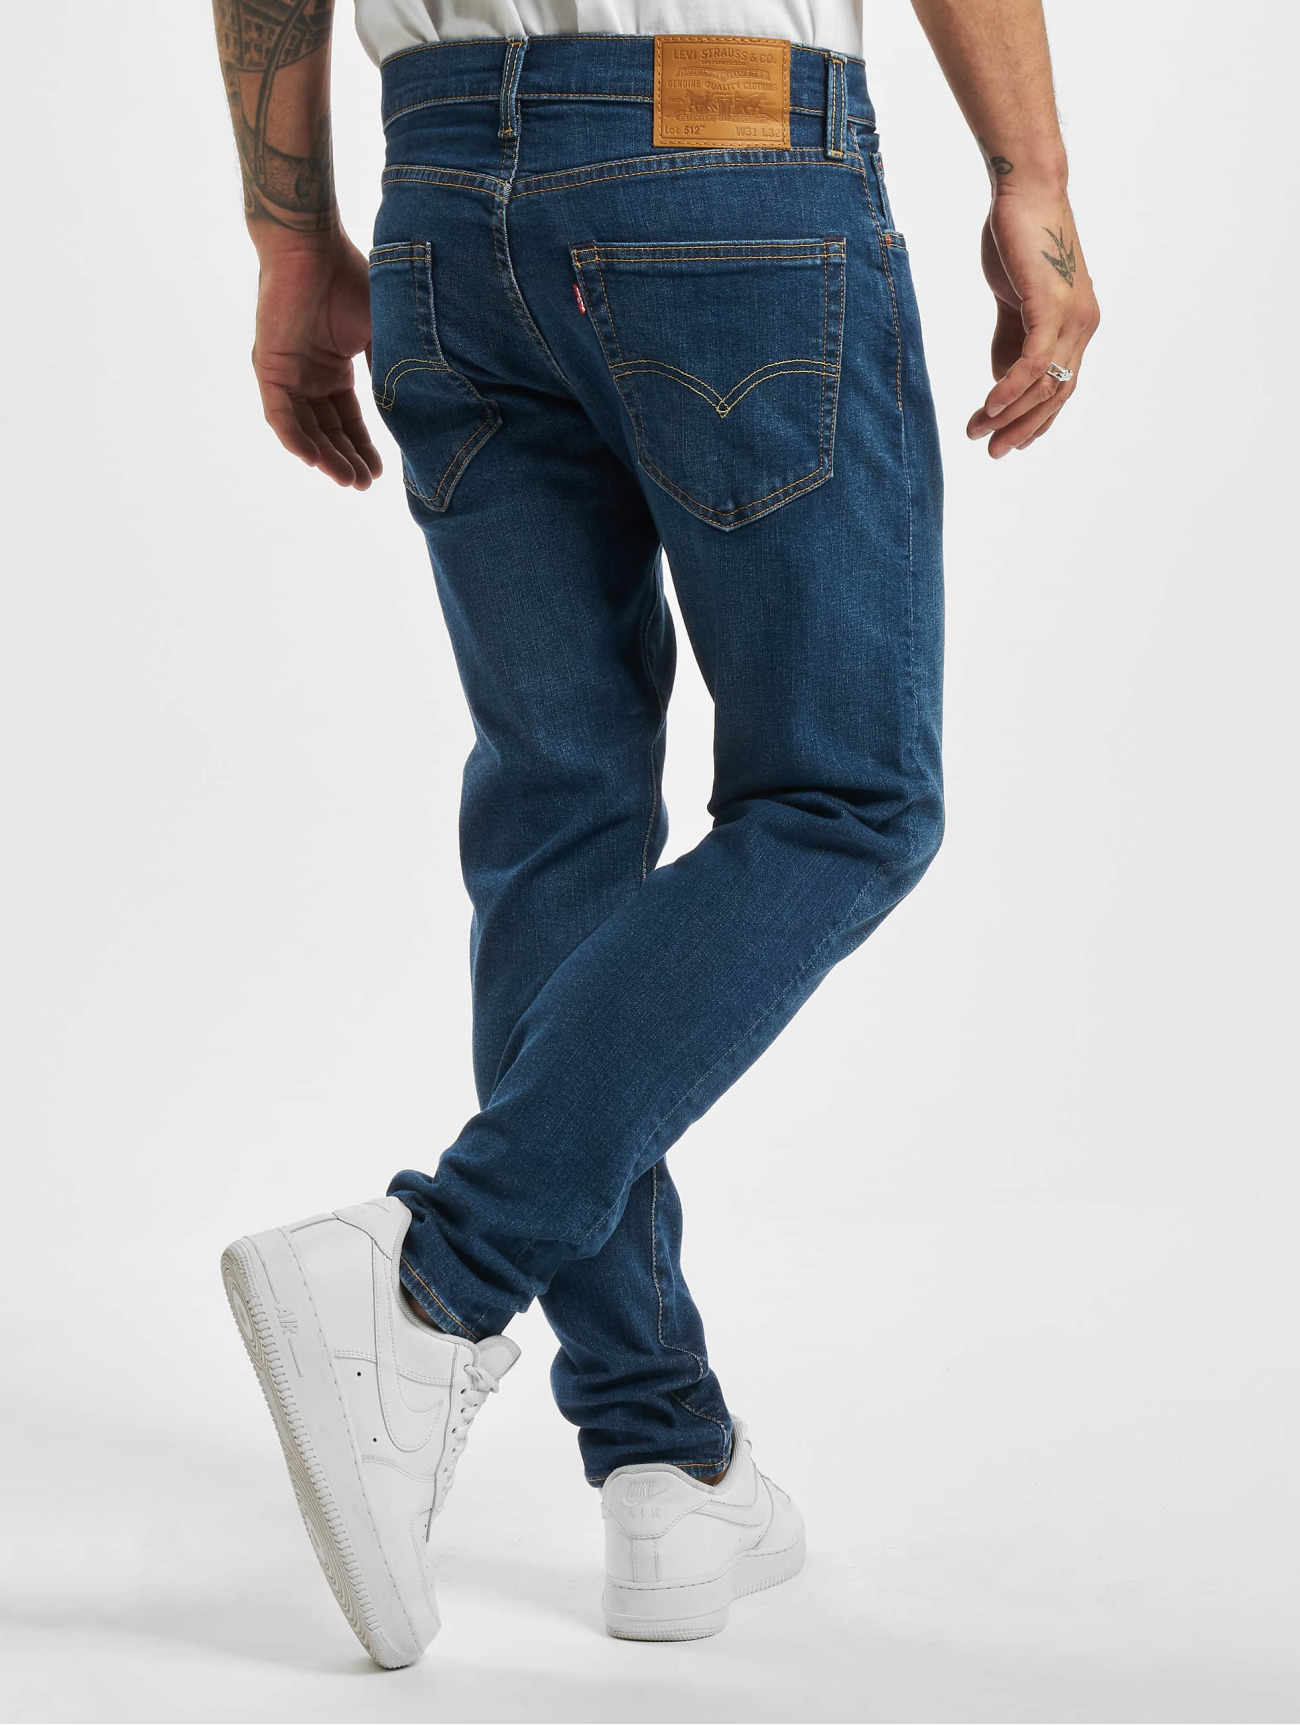 Levi's®  512 Revolt Adv  bleu Homme Jean slim  578569 Homme Jeans